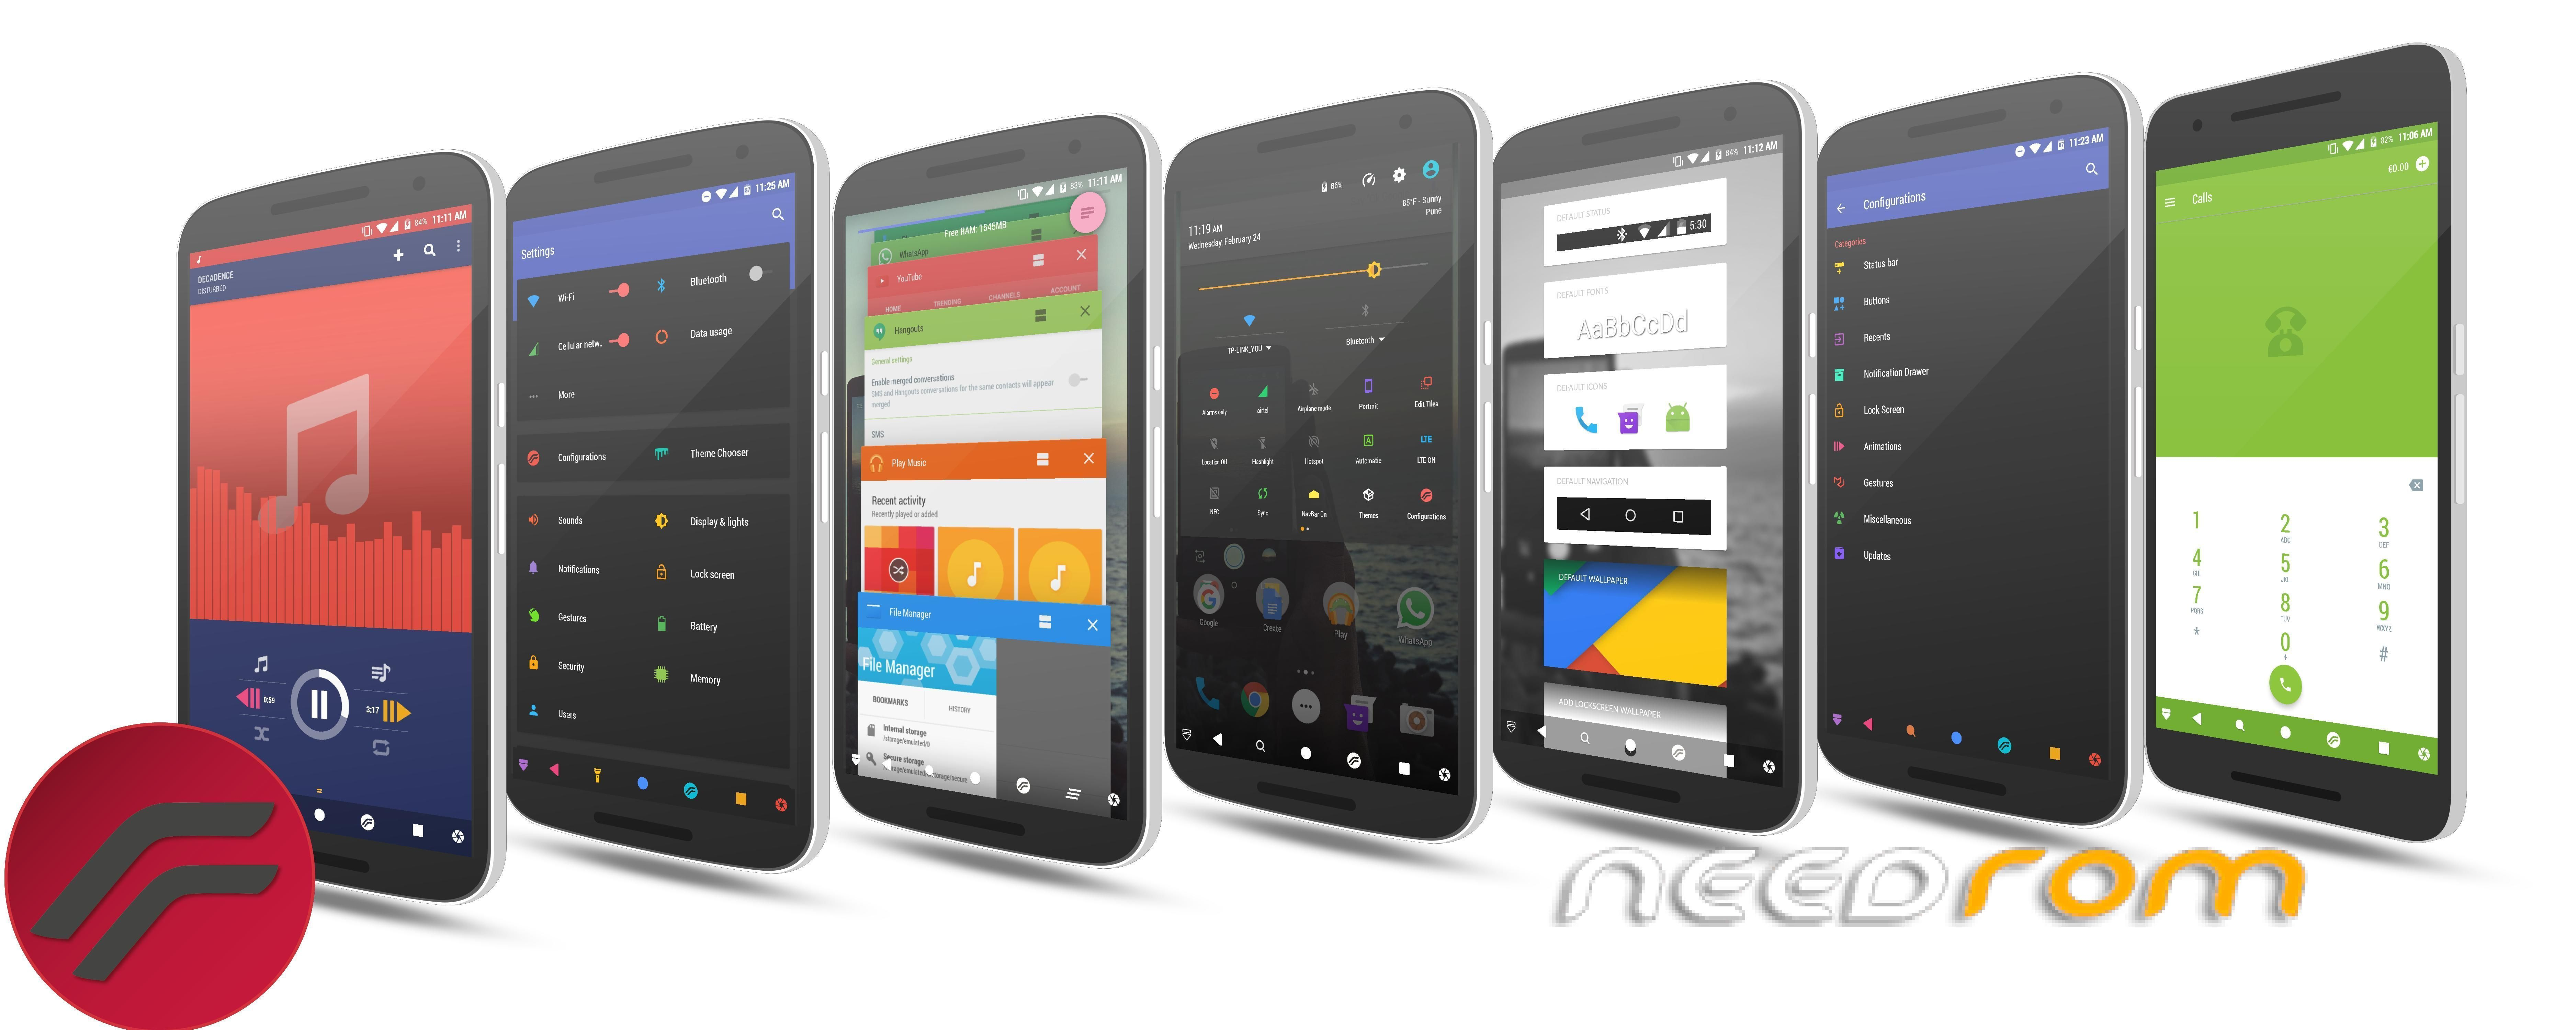 ROM Resurrection Remix 5 8 5 (Android 7 1 2_Lenovo-P70